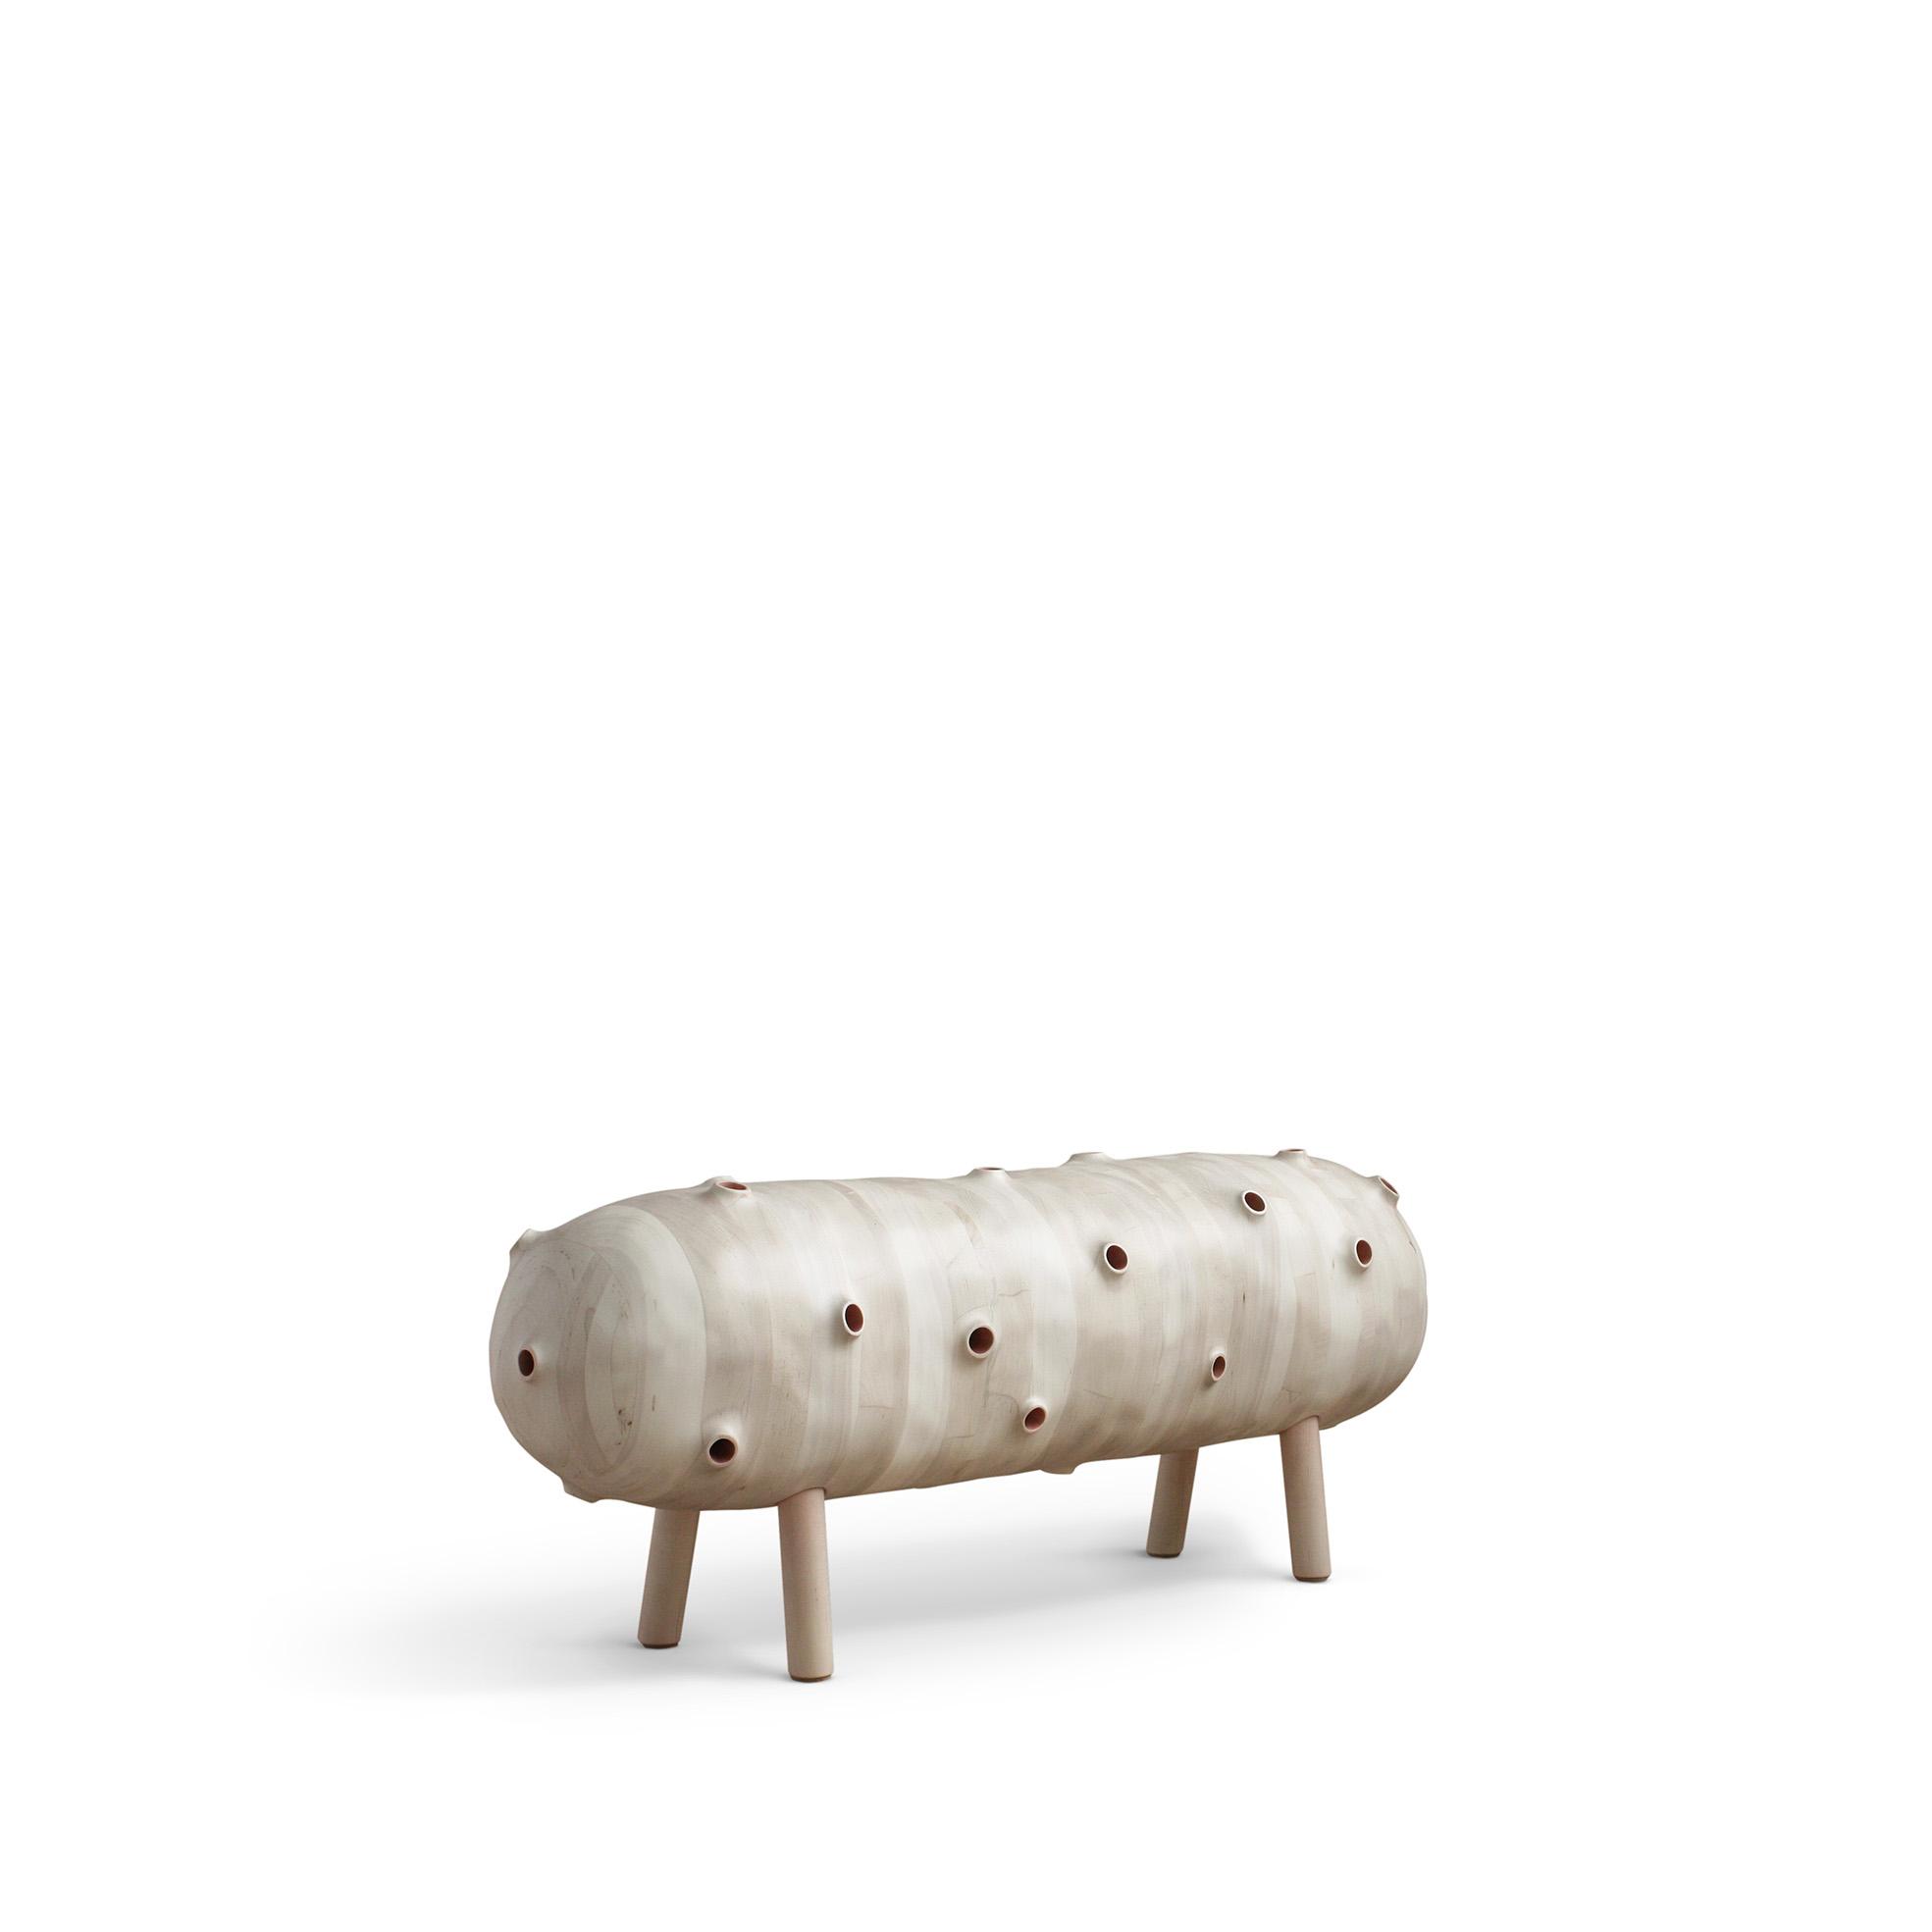 "Julian Watts, United States ""Bench"", maple wood, 330 x 1244 x 482 mm (2017)"